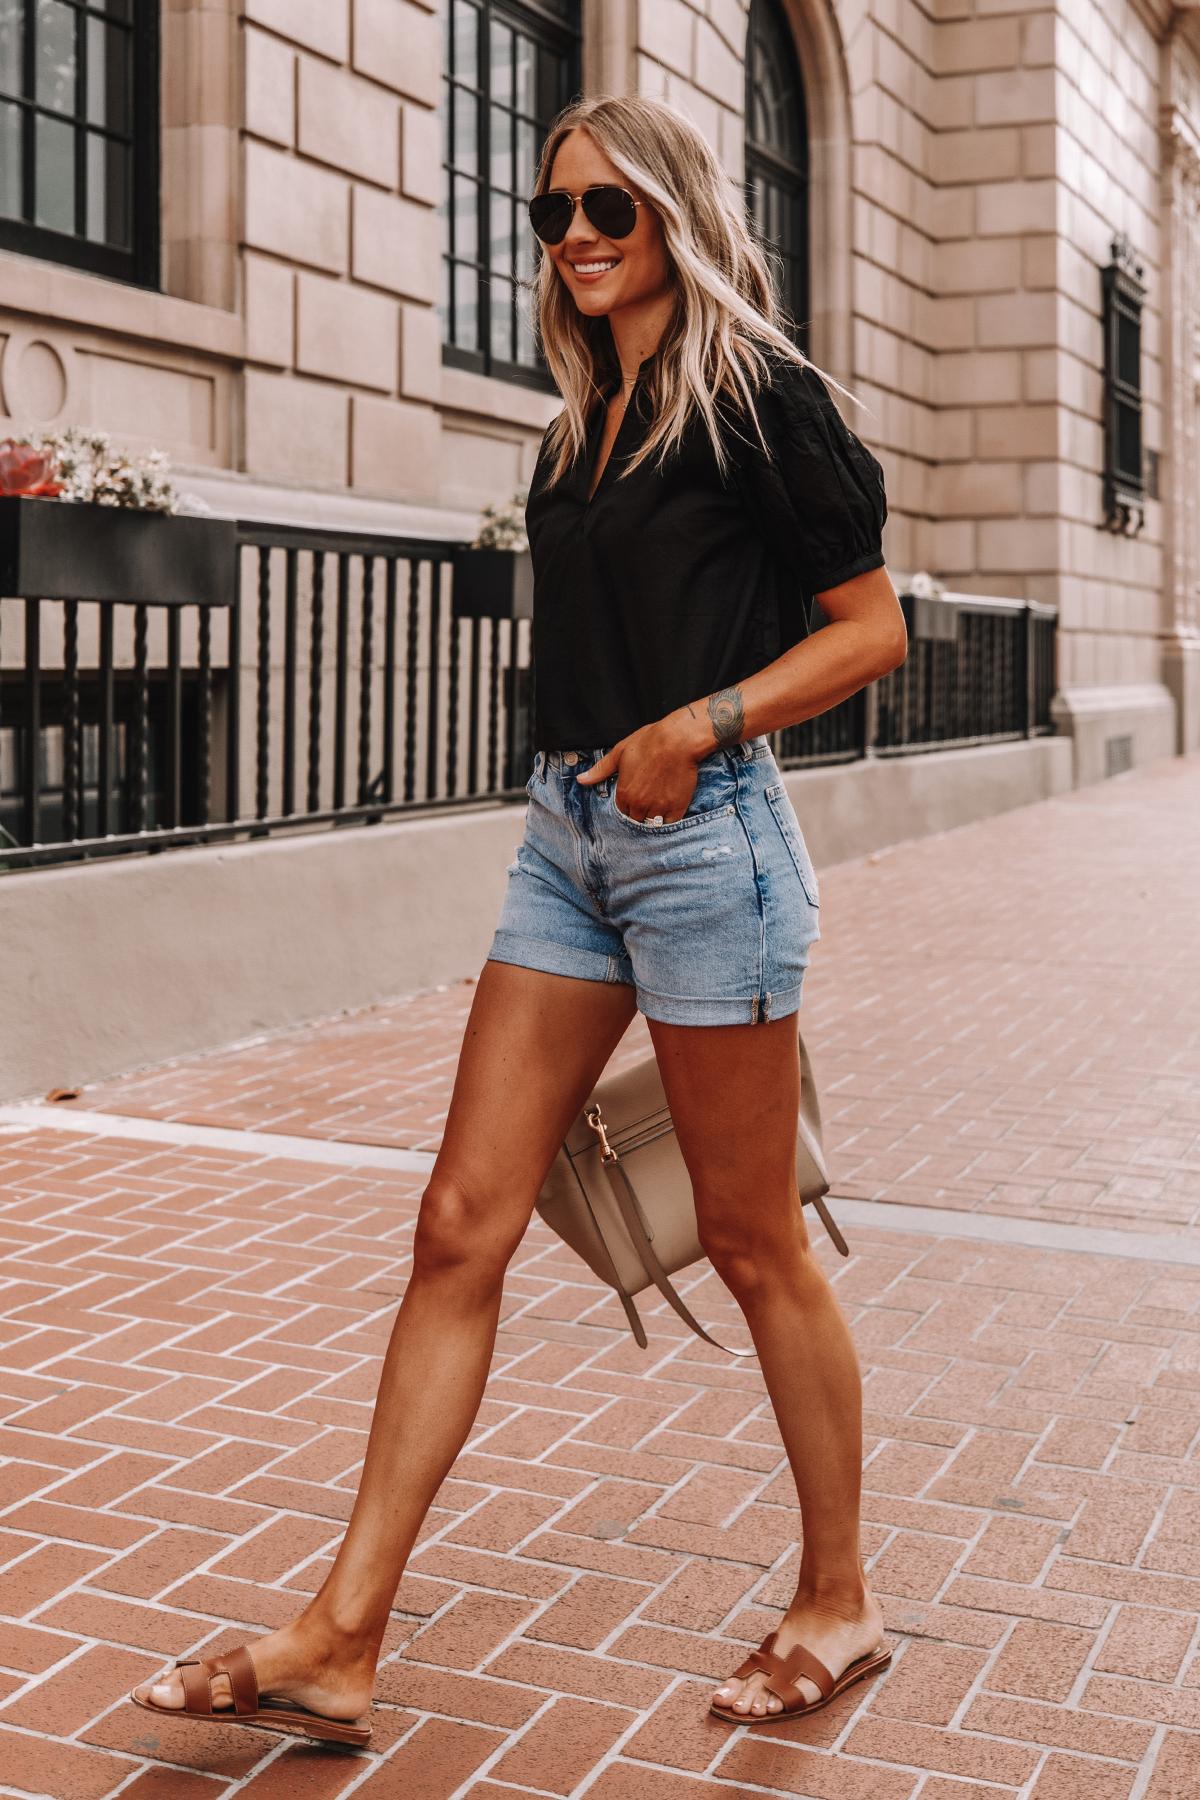 Fashion Jackson Wearing Black Everlane Split Neck Puff Sleeve Air Shirt Everlane Denim Shorts Tan Sandals Summer Outfit 1